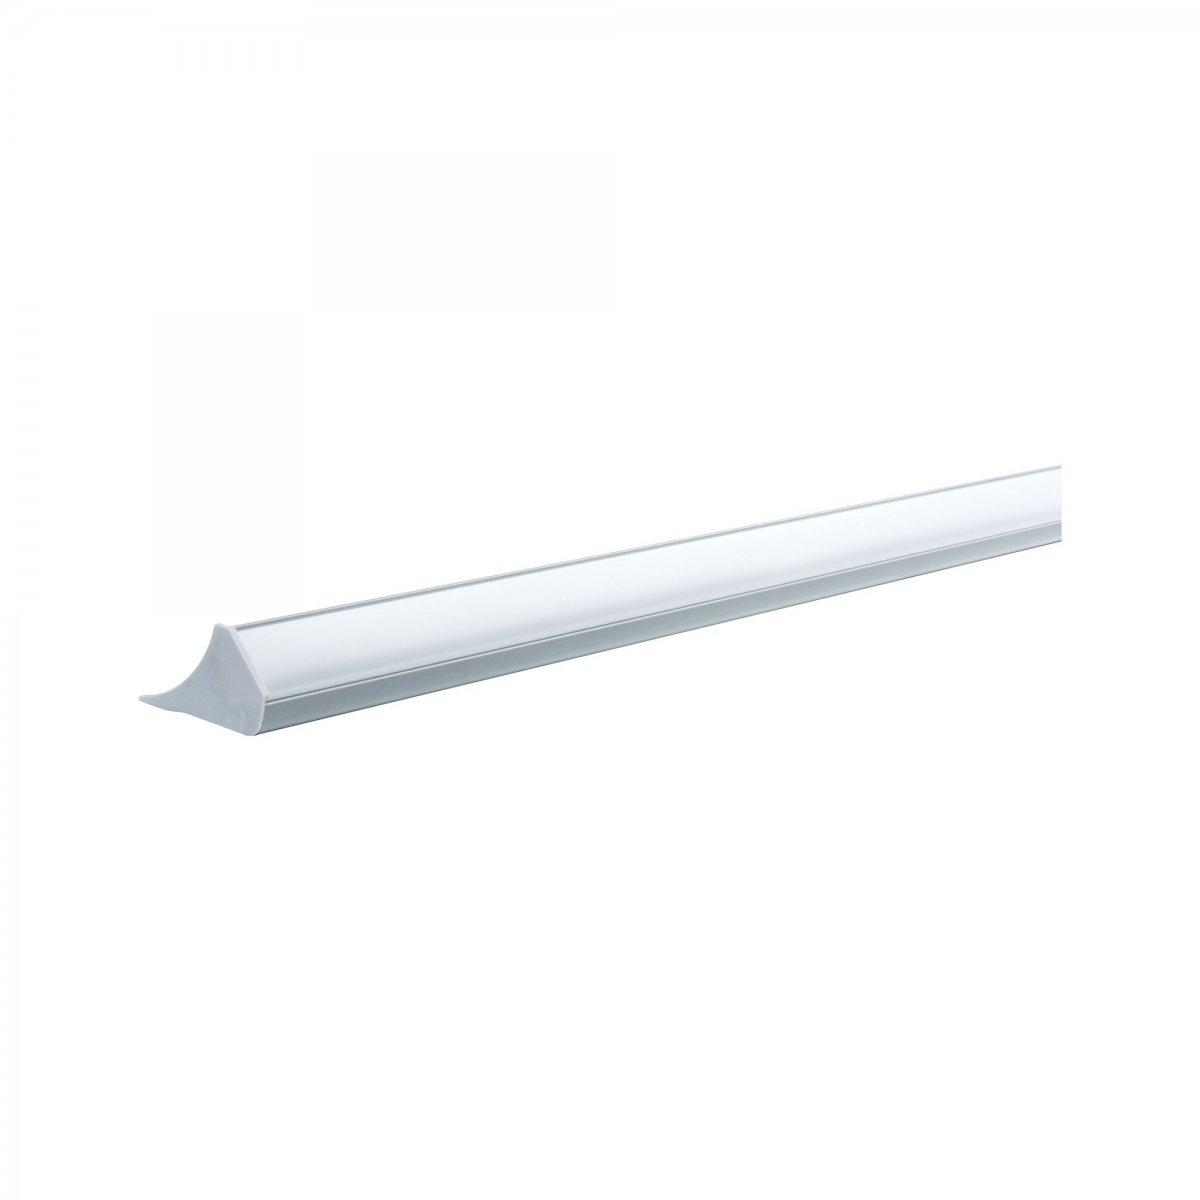 raumbeleuchtung corner profil mit yourled led stripes gesucht hier finden sie. Black Bedroom Furniture Sets. Home Design Ideas